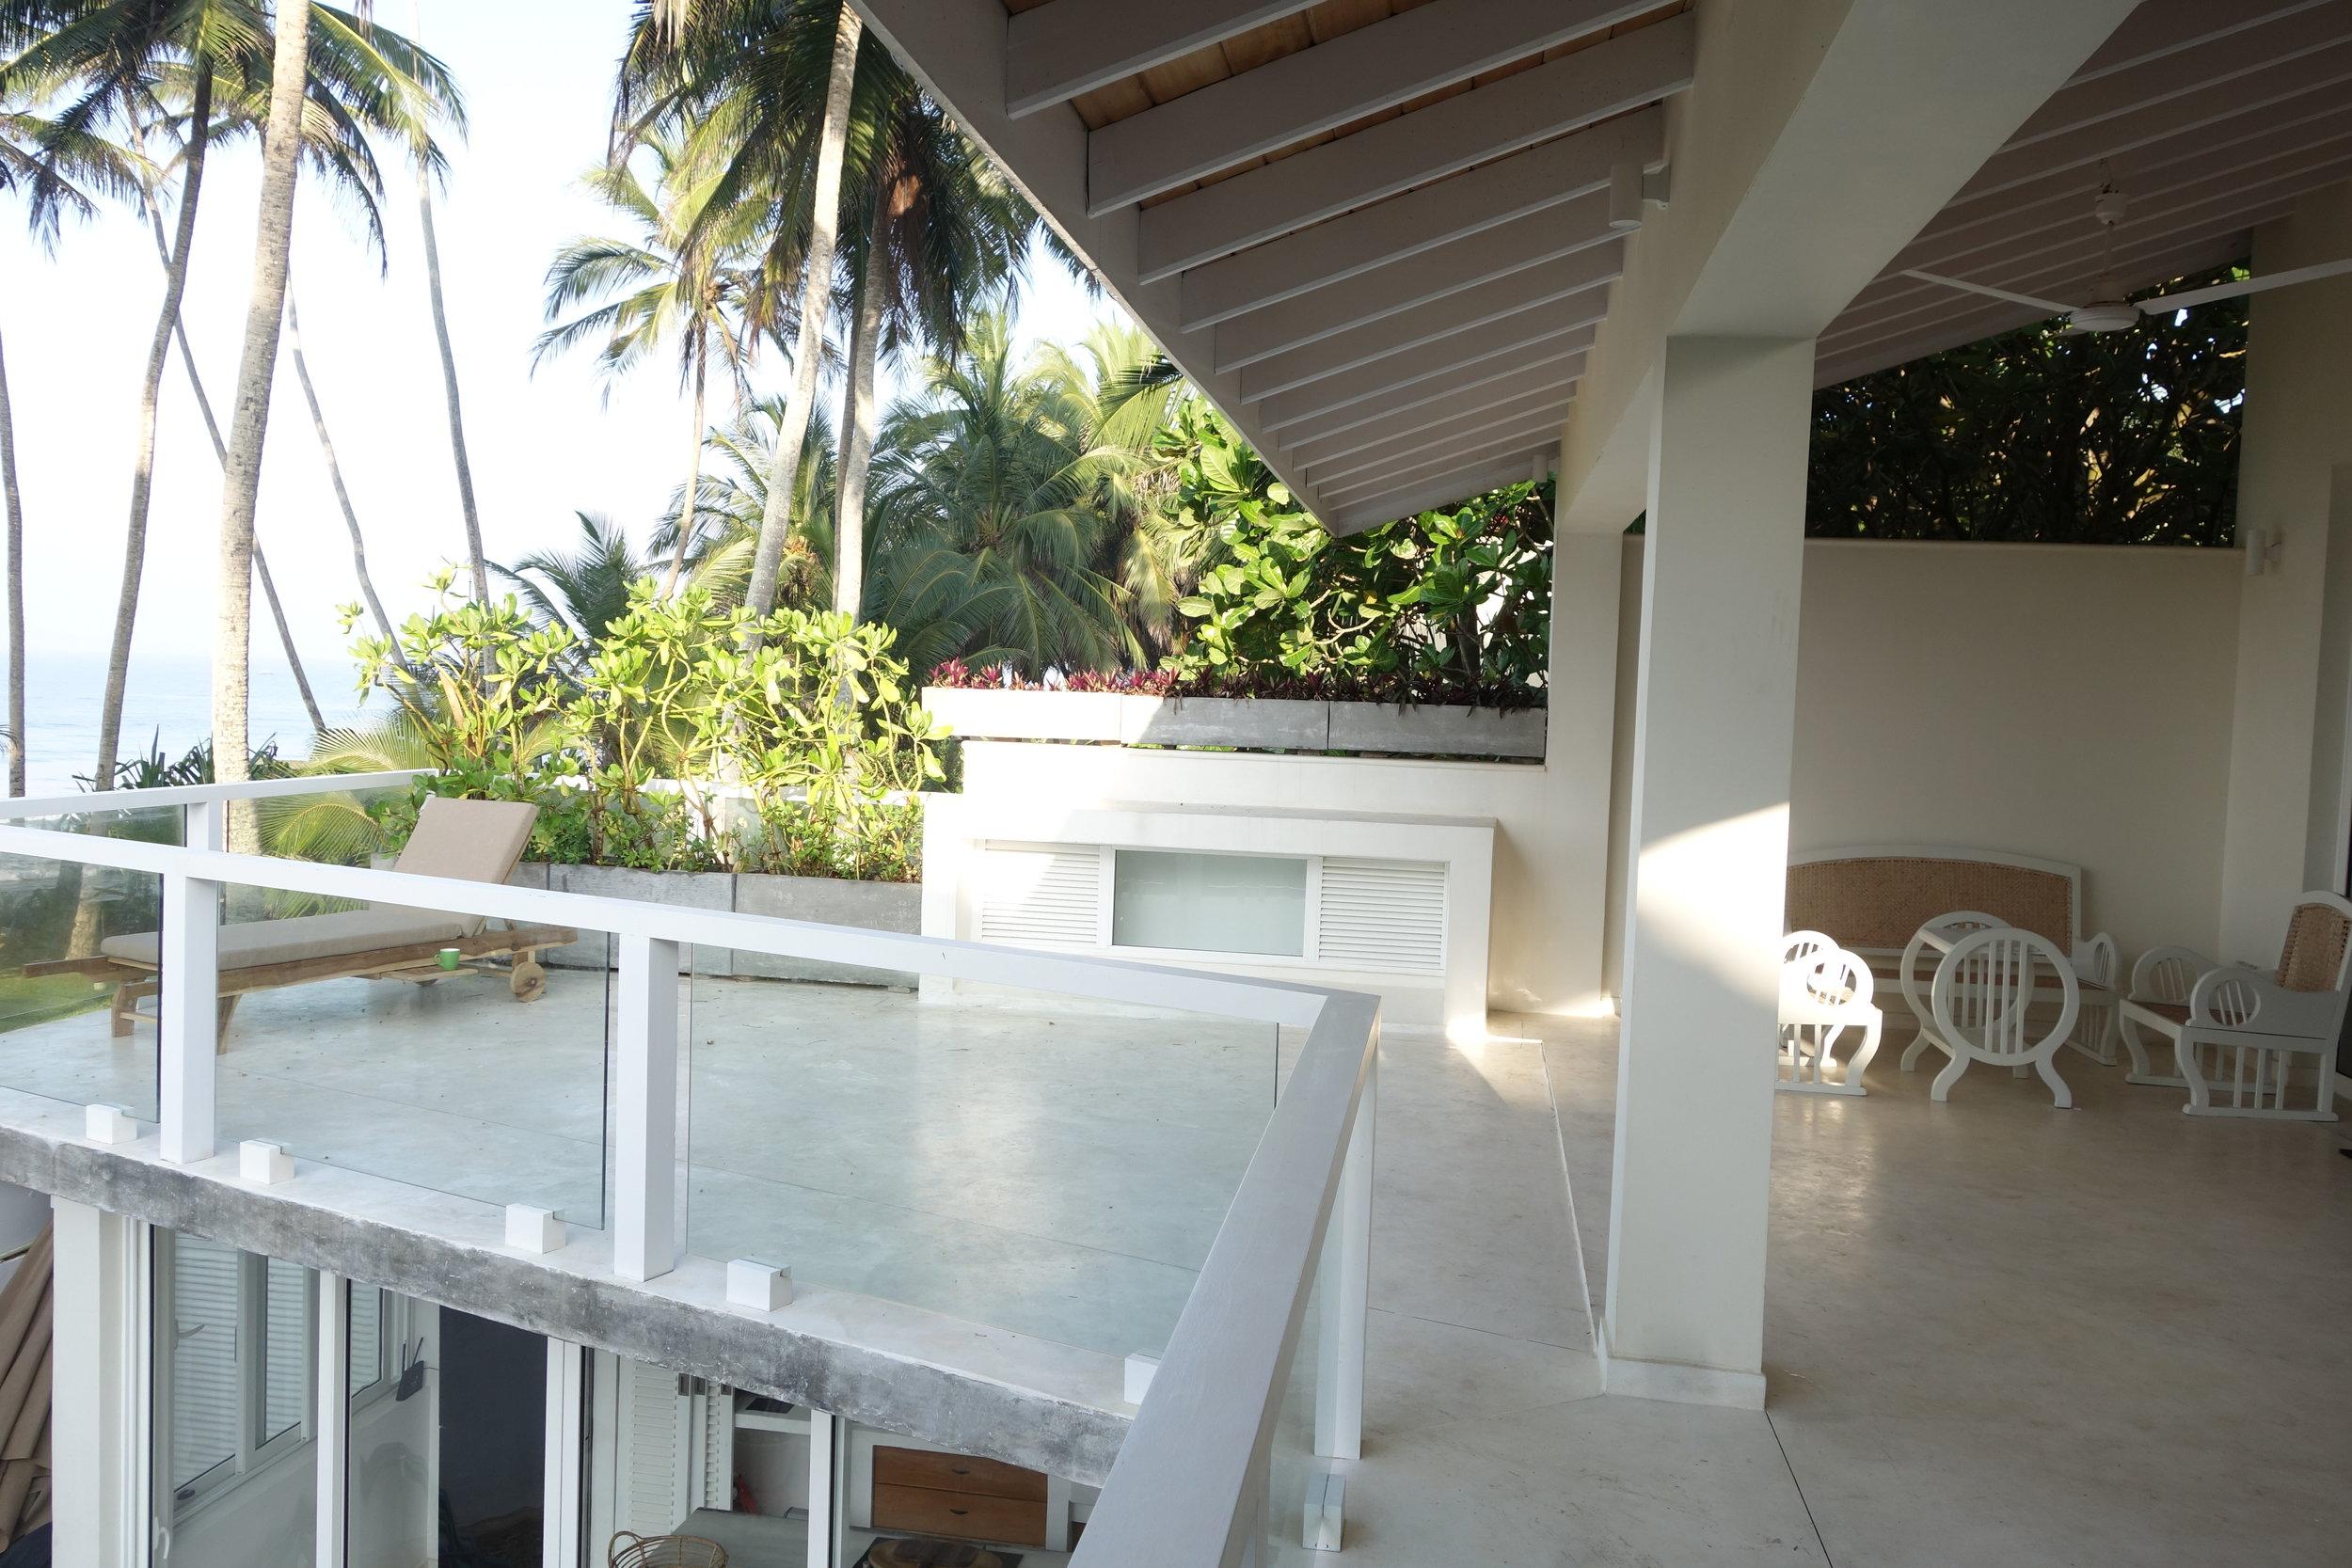 Verandah & open space